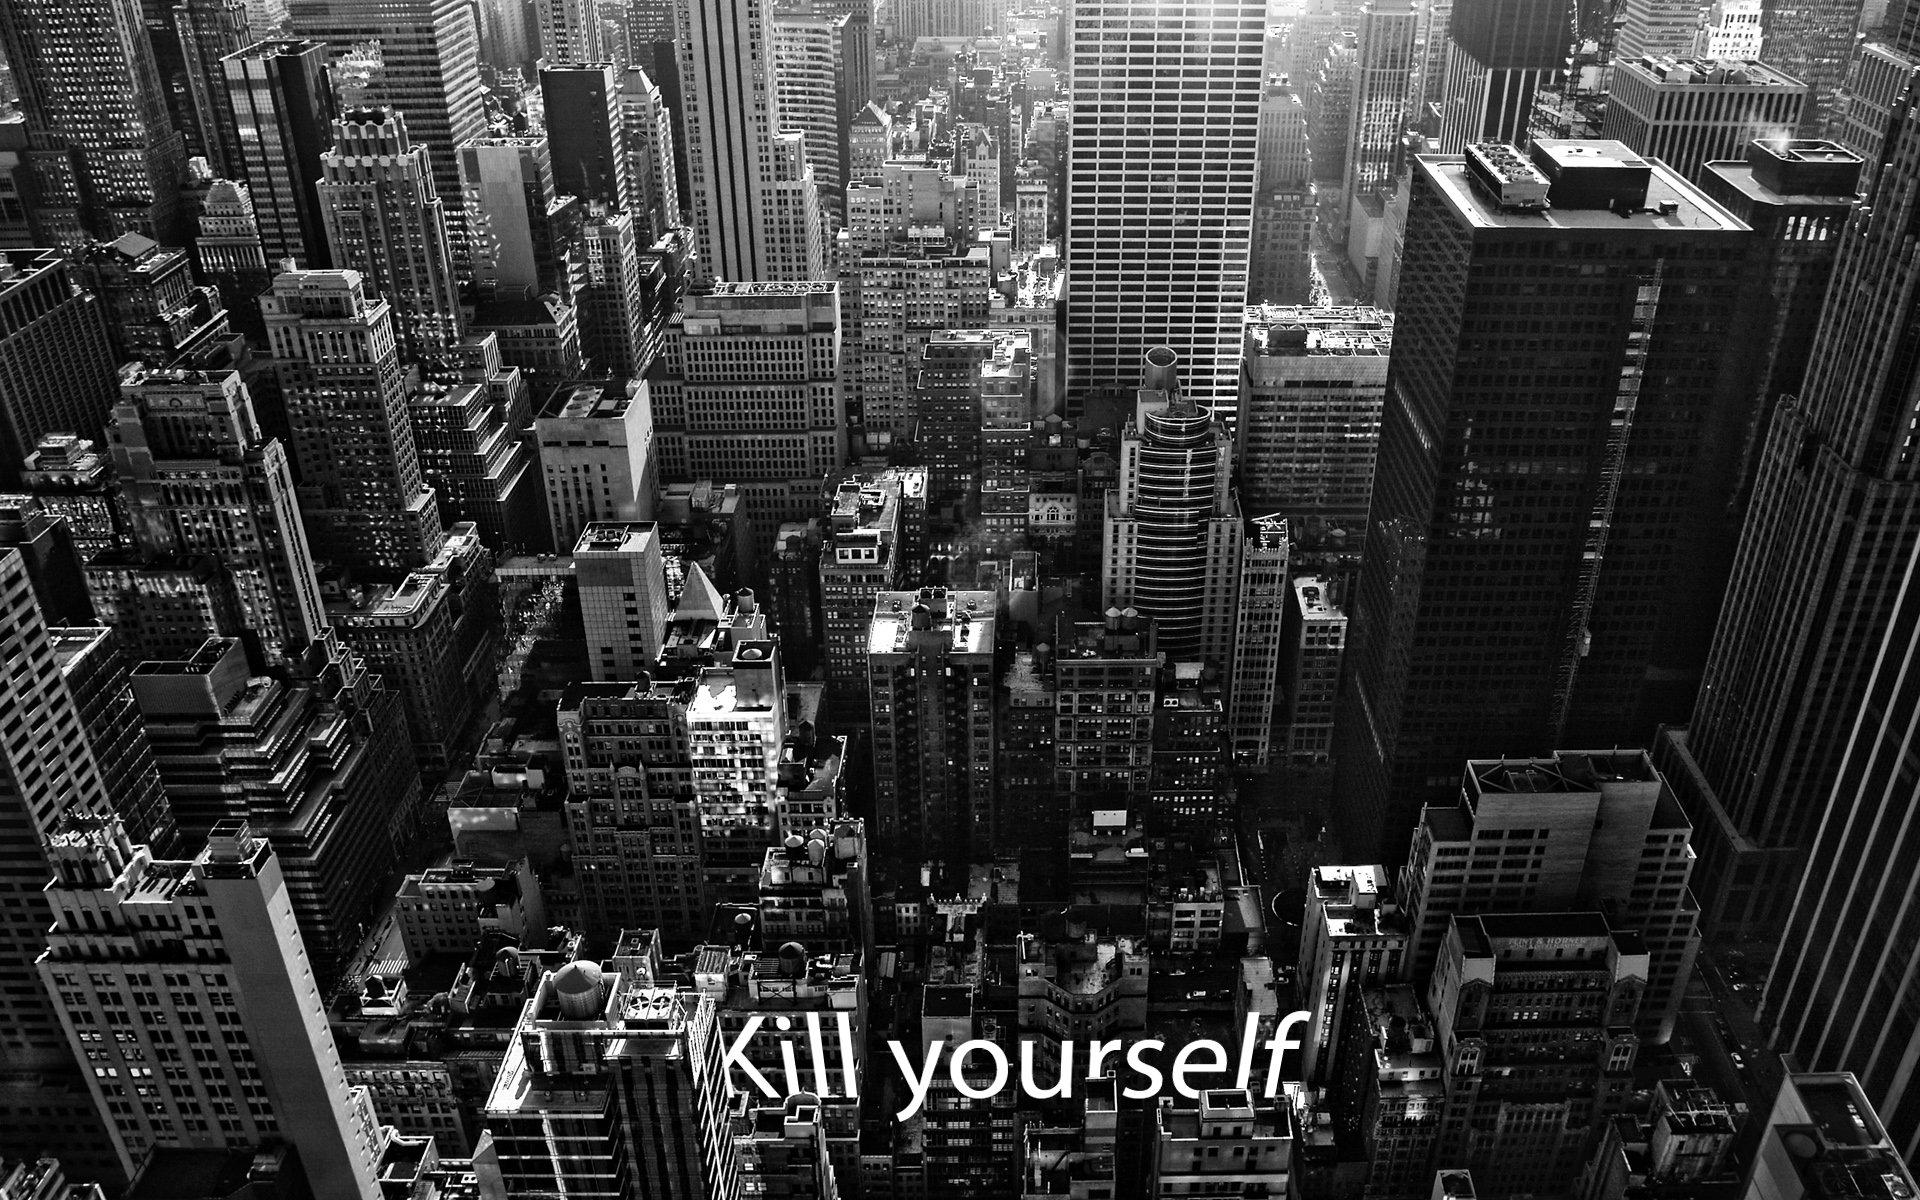 Kill Yourself